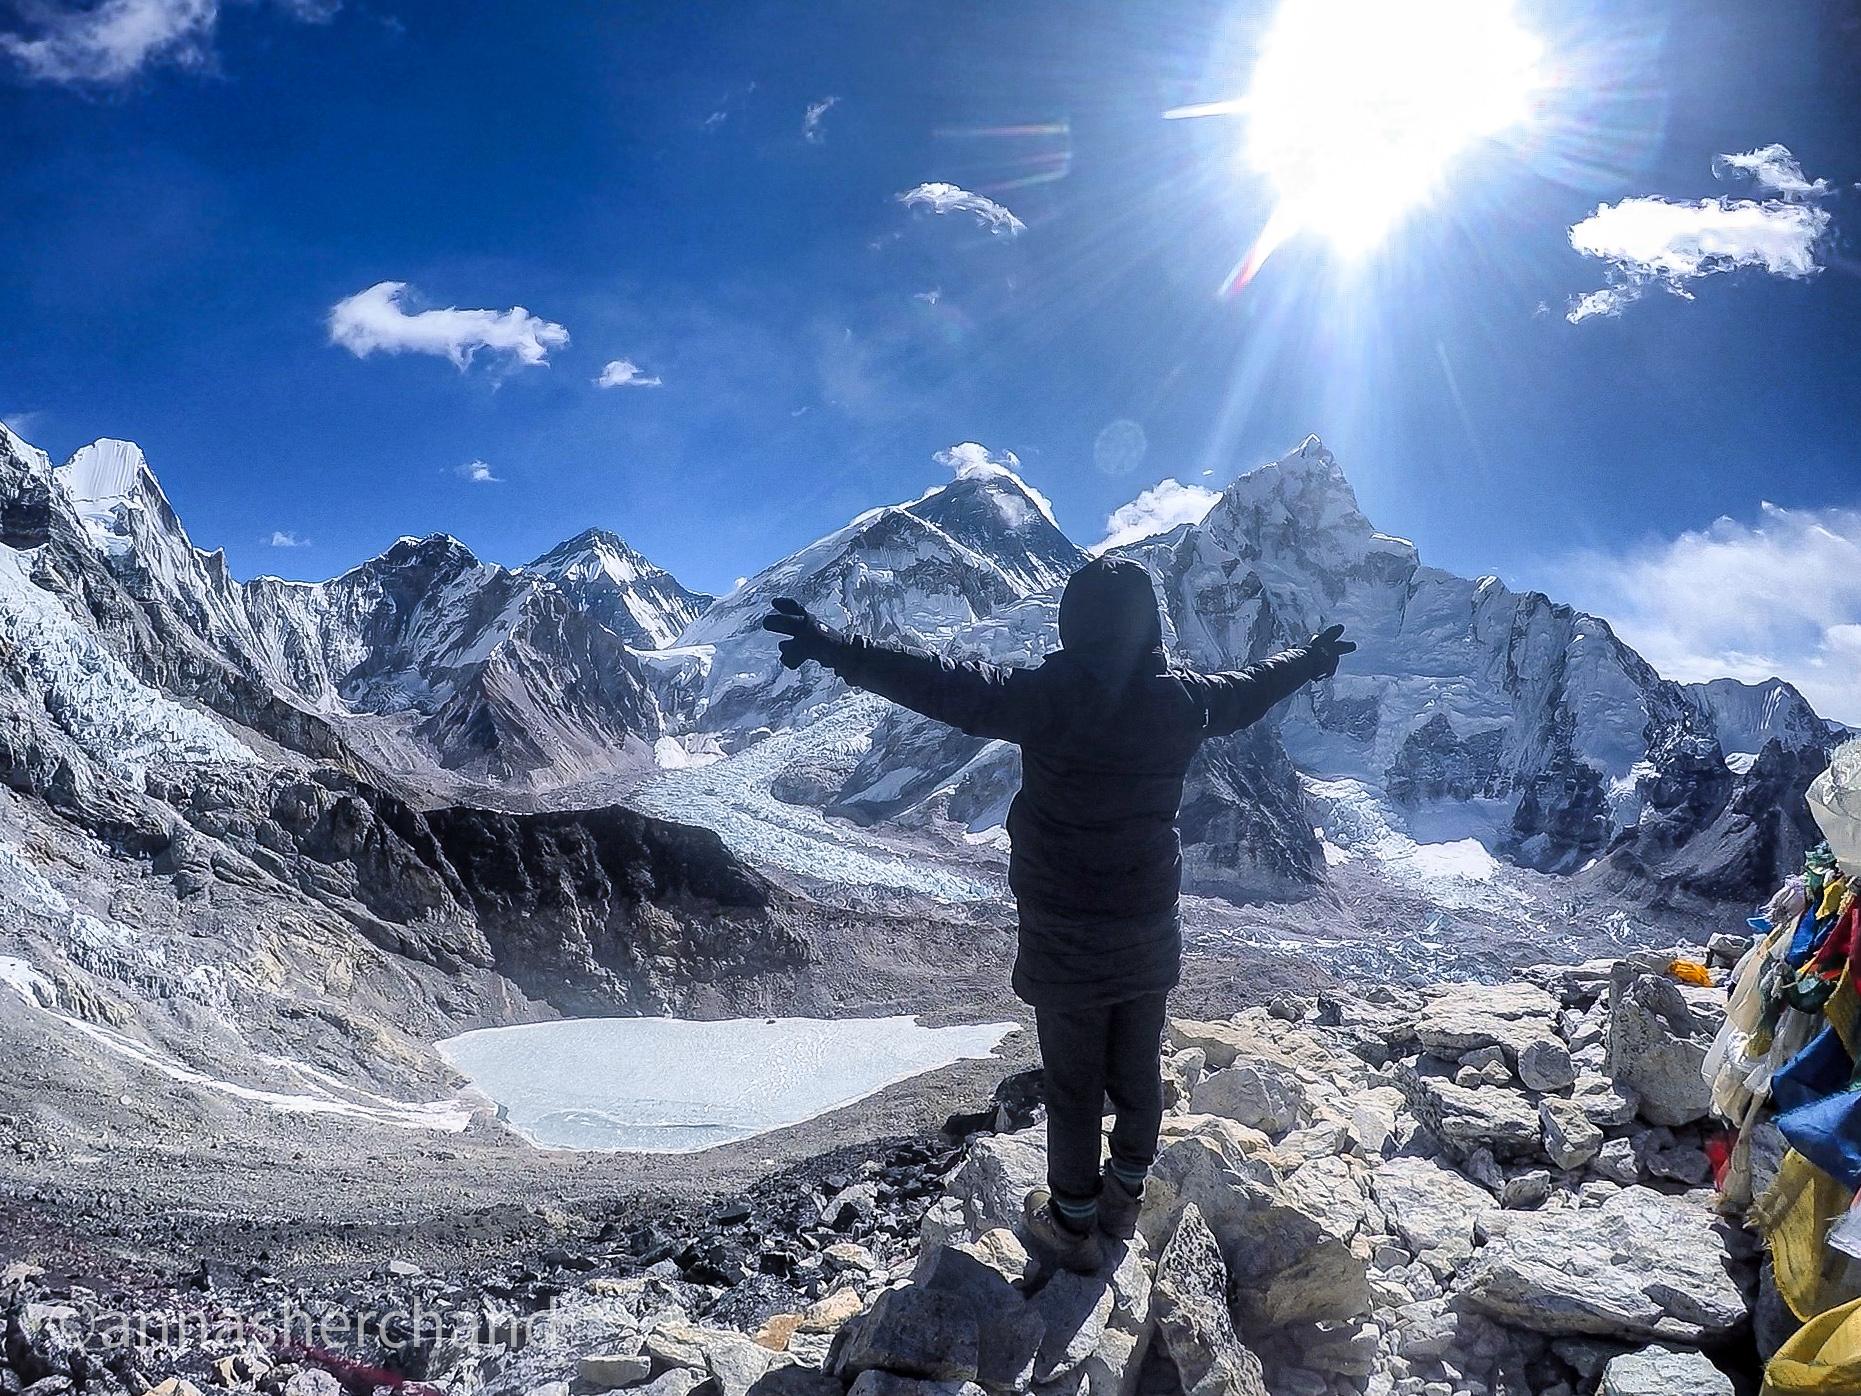 Adventure outdoors travel blogger